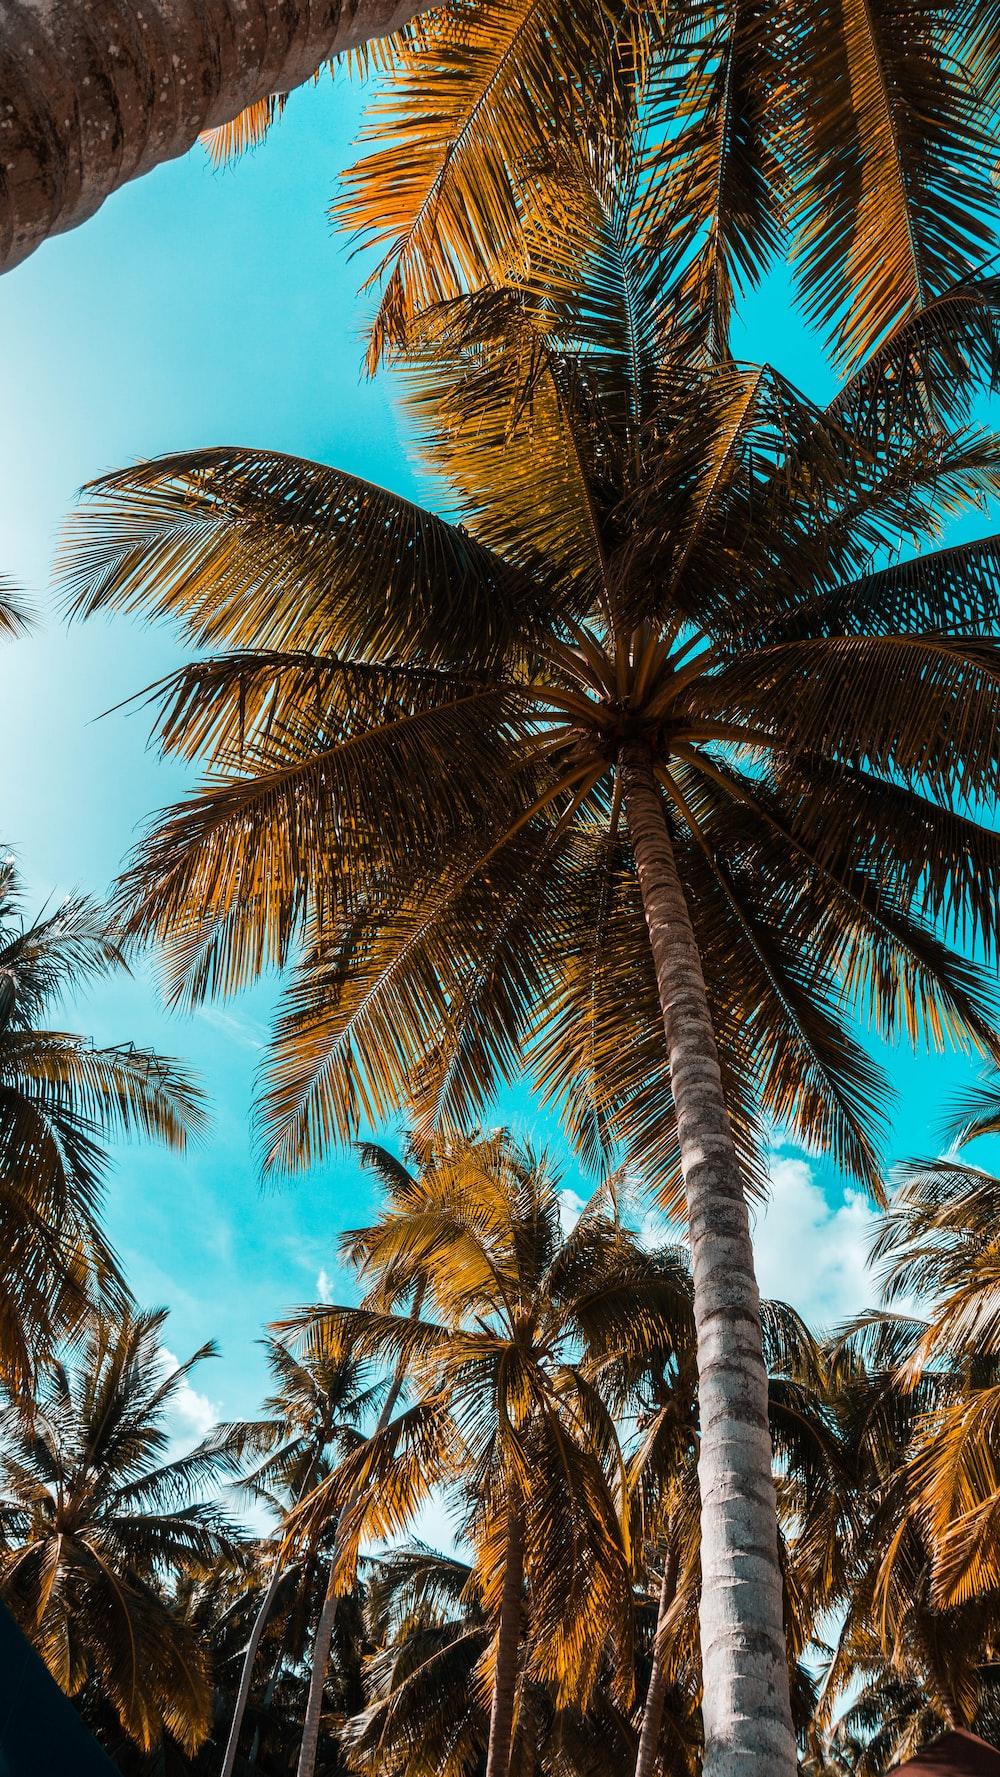 worm's-eye photography of coconut tree